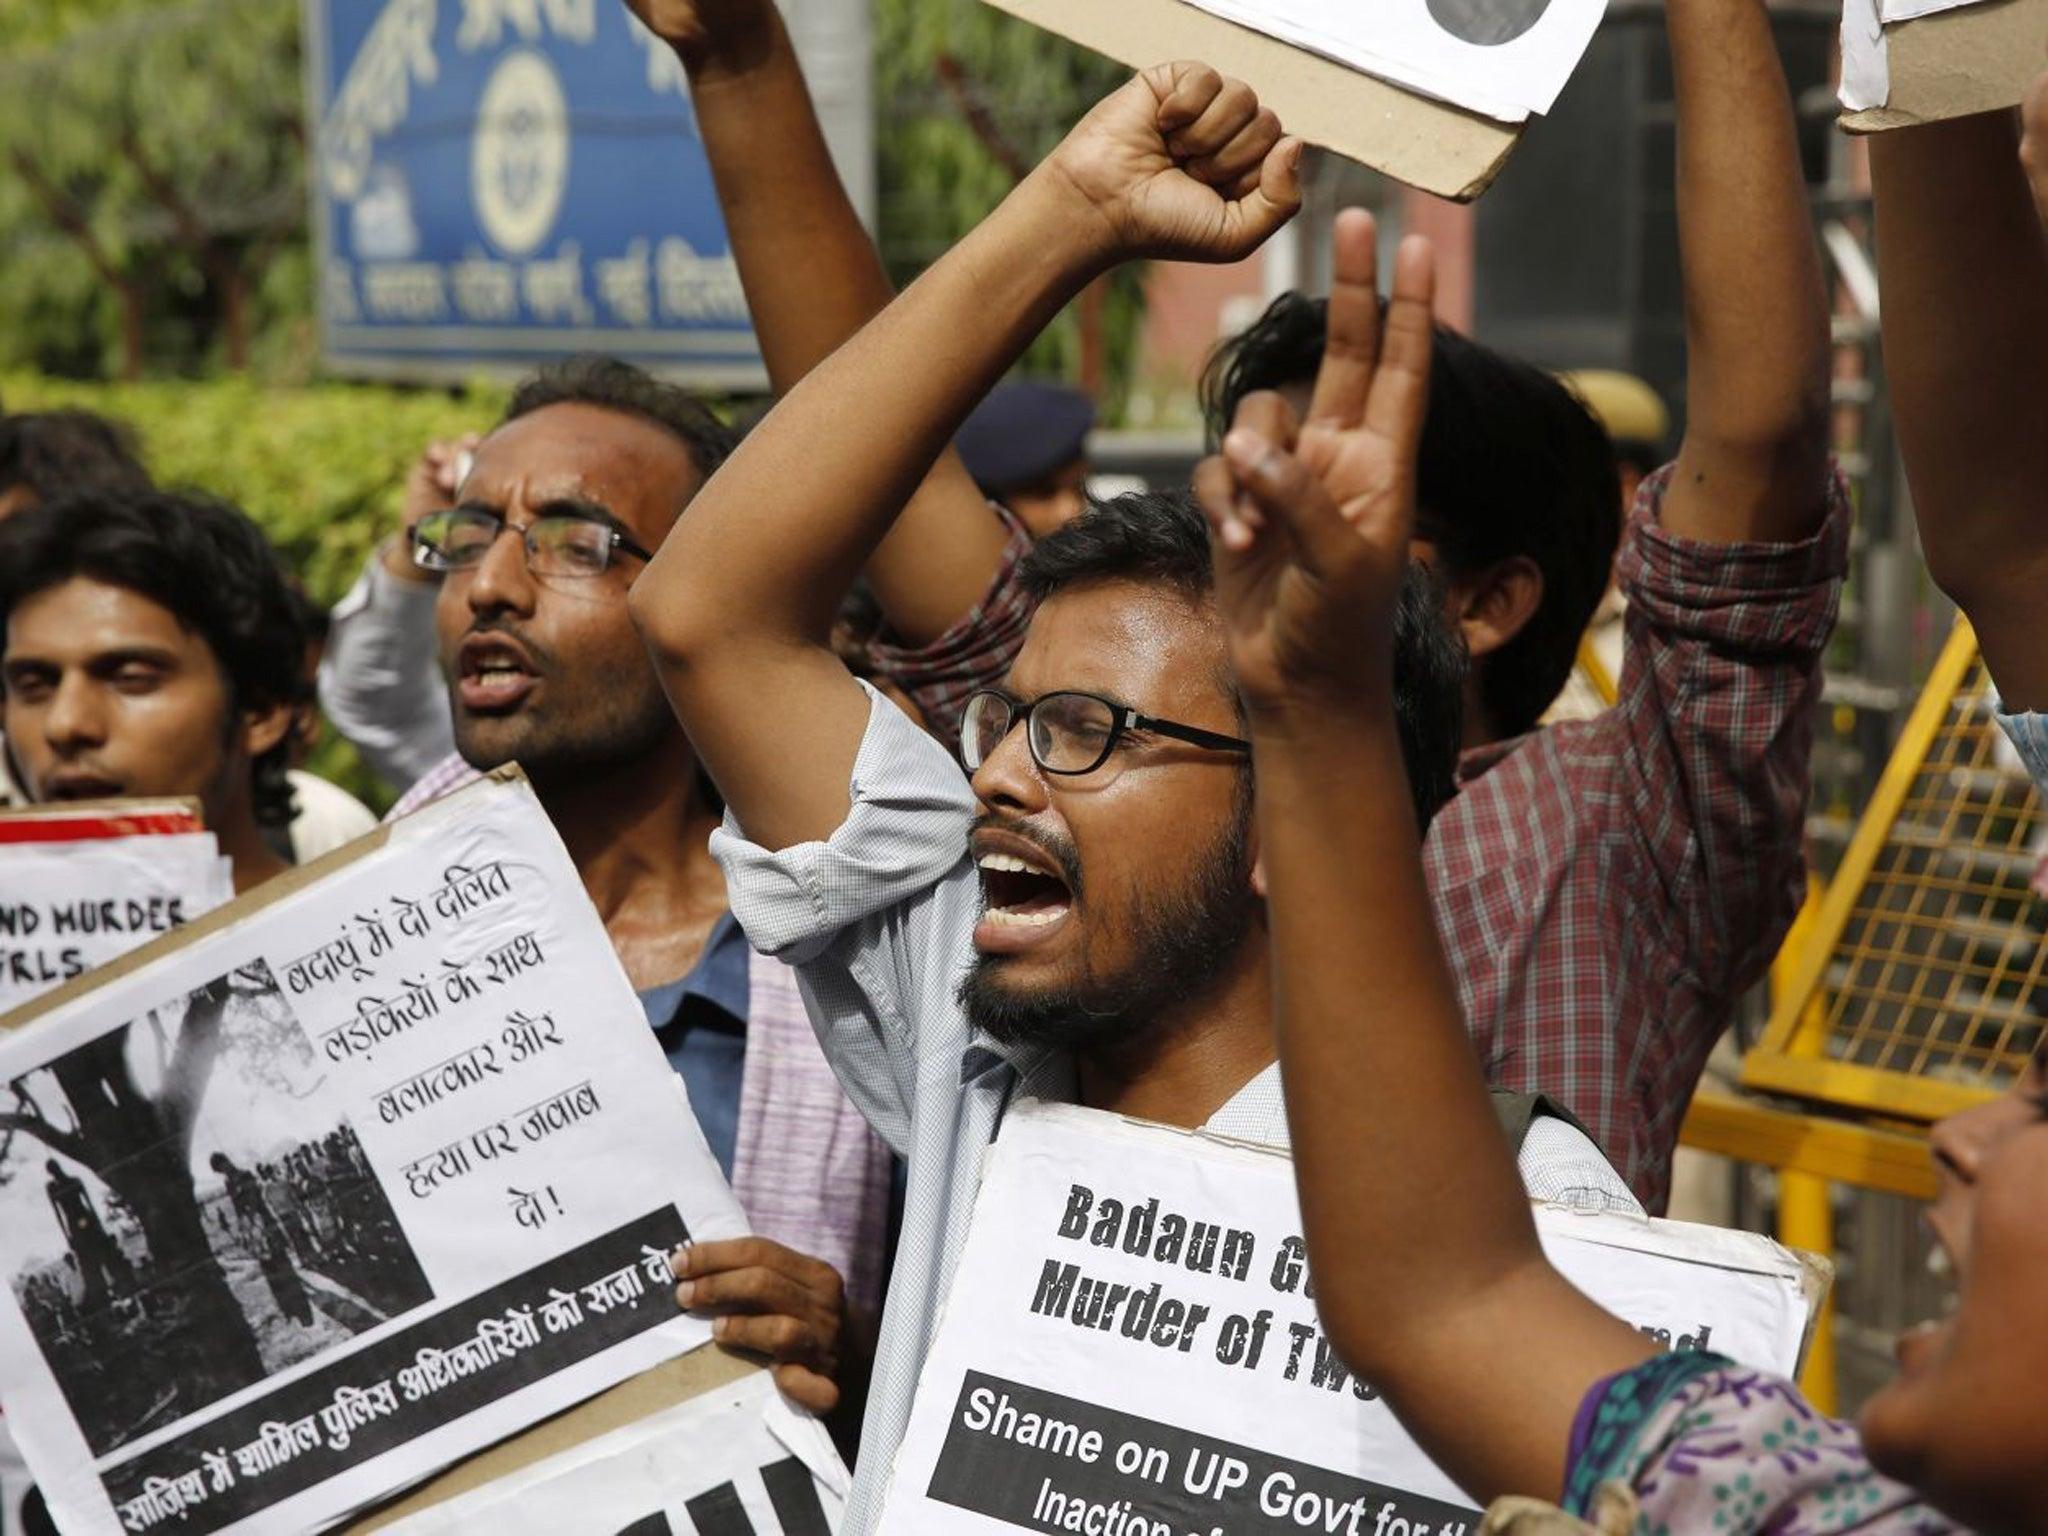 Delhi bus rapist blames dead victim for attack because 'girls are